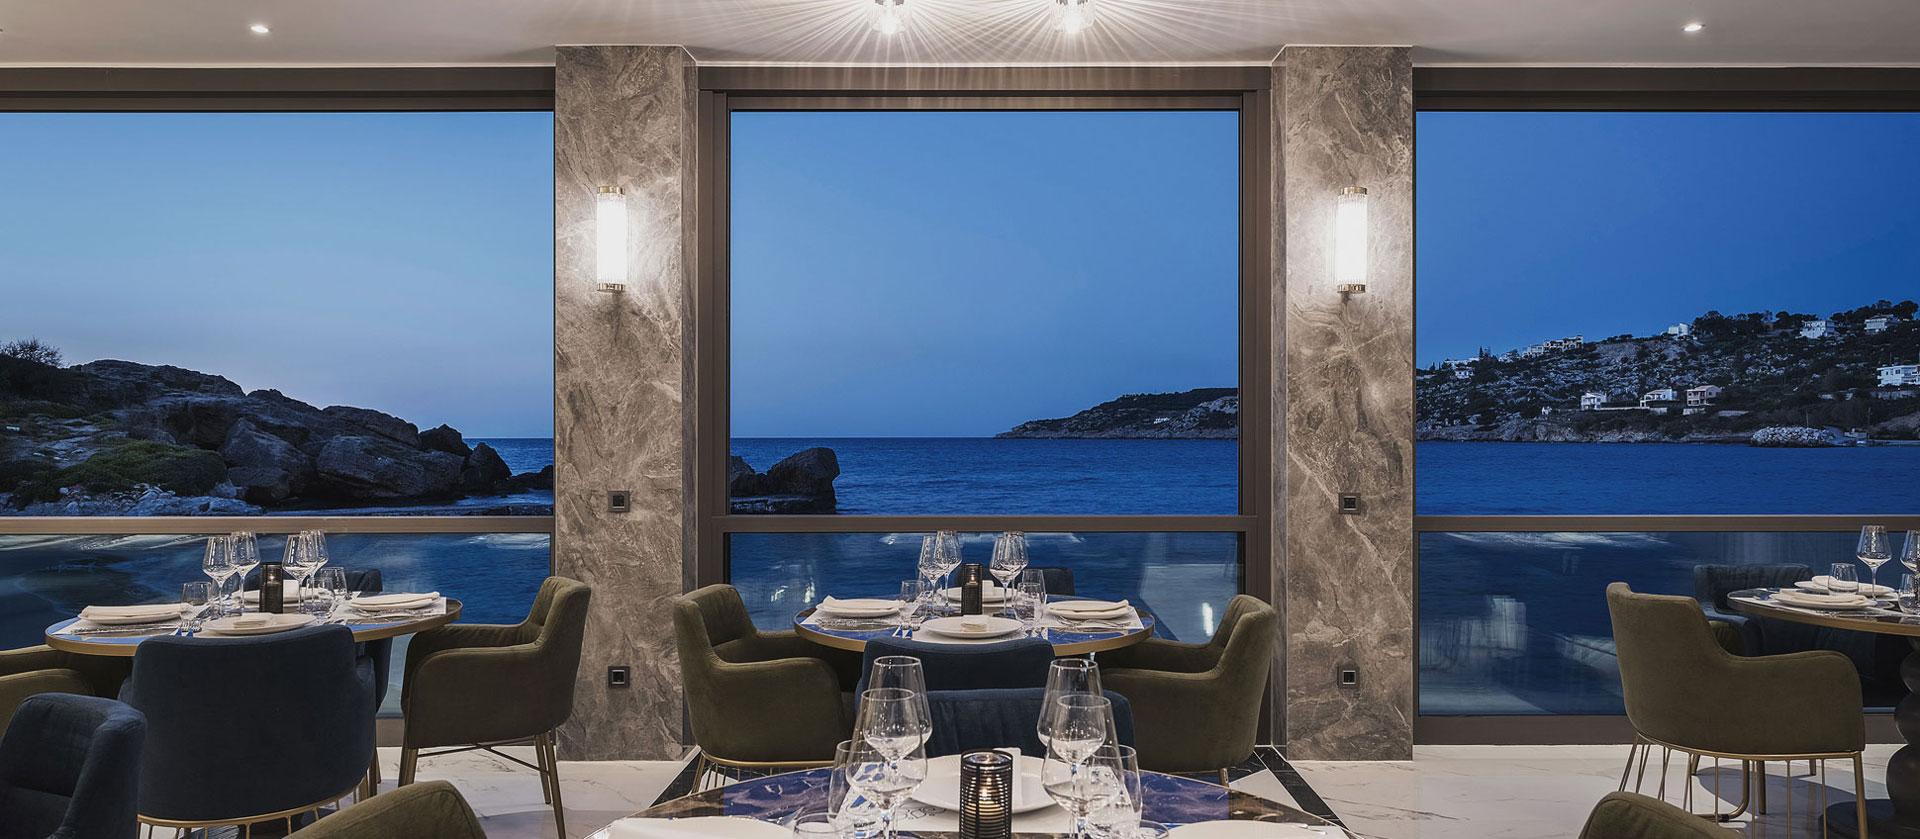 best restaurants in Chania- rated restaurants chania- chania best restaurants- Almyvita- Michelin Guide